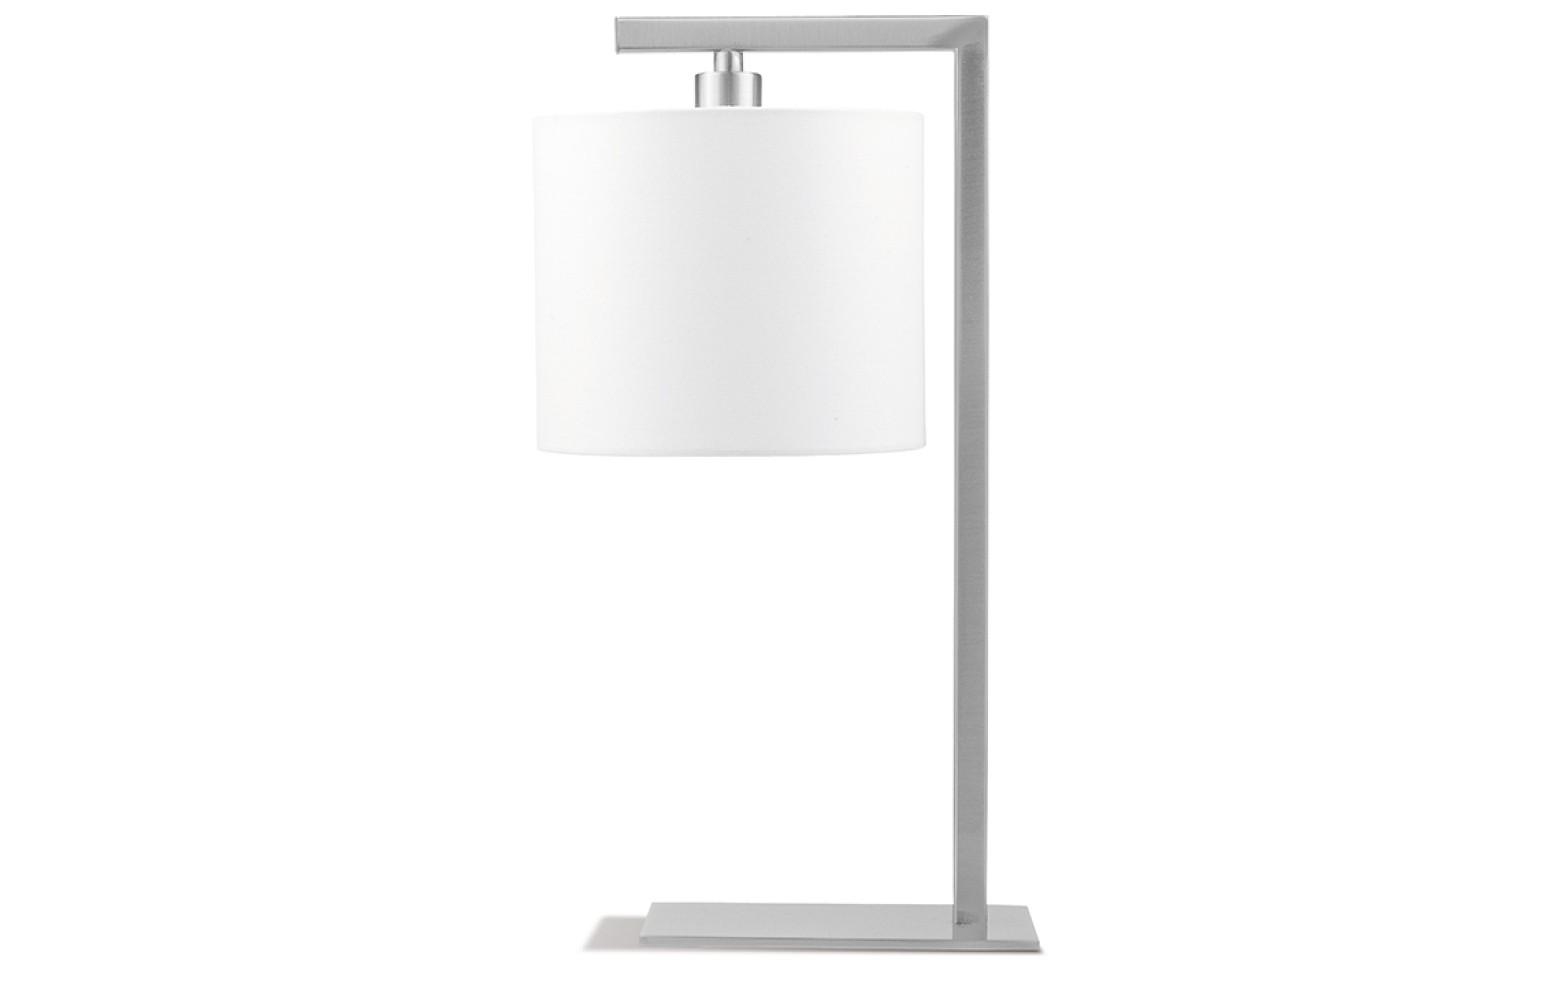 boston lampen kleinm bel accessoires who 39 s perfect. Black Bedroom Furniture Sets. Home Design Ideas